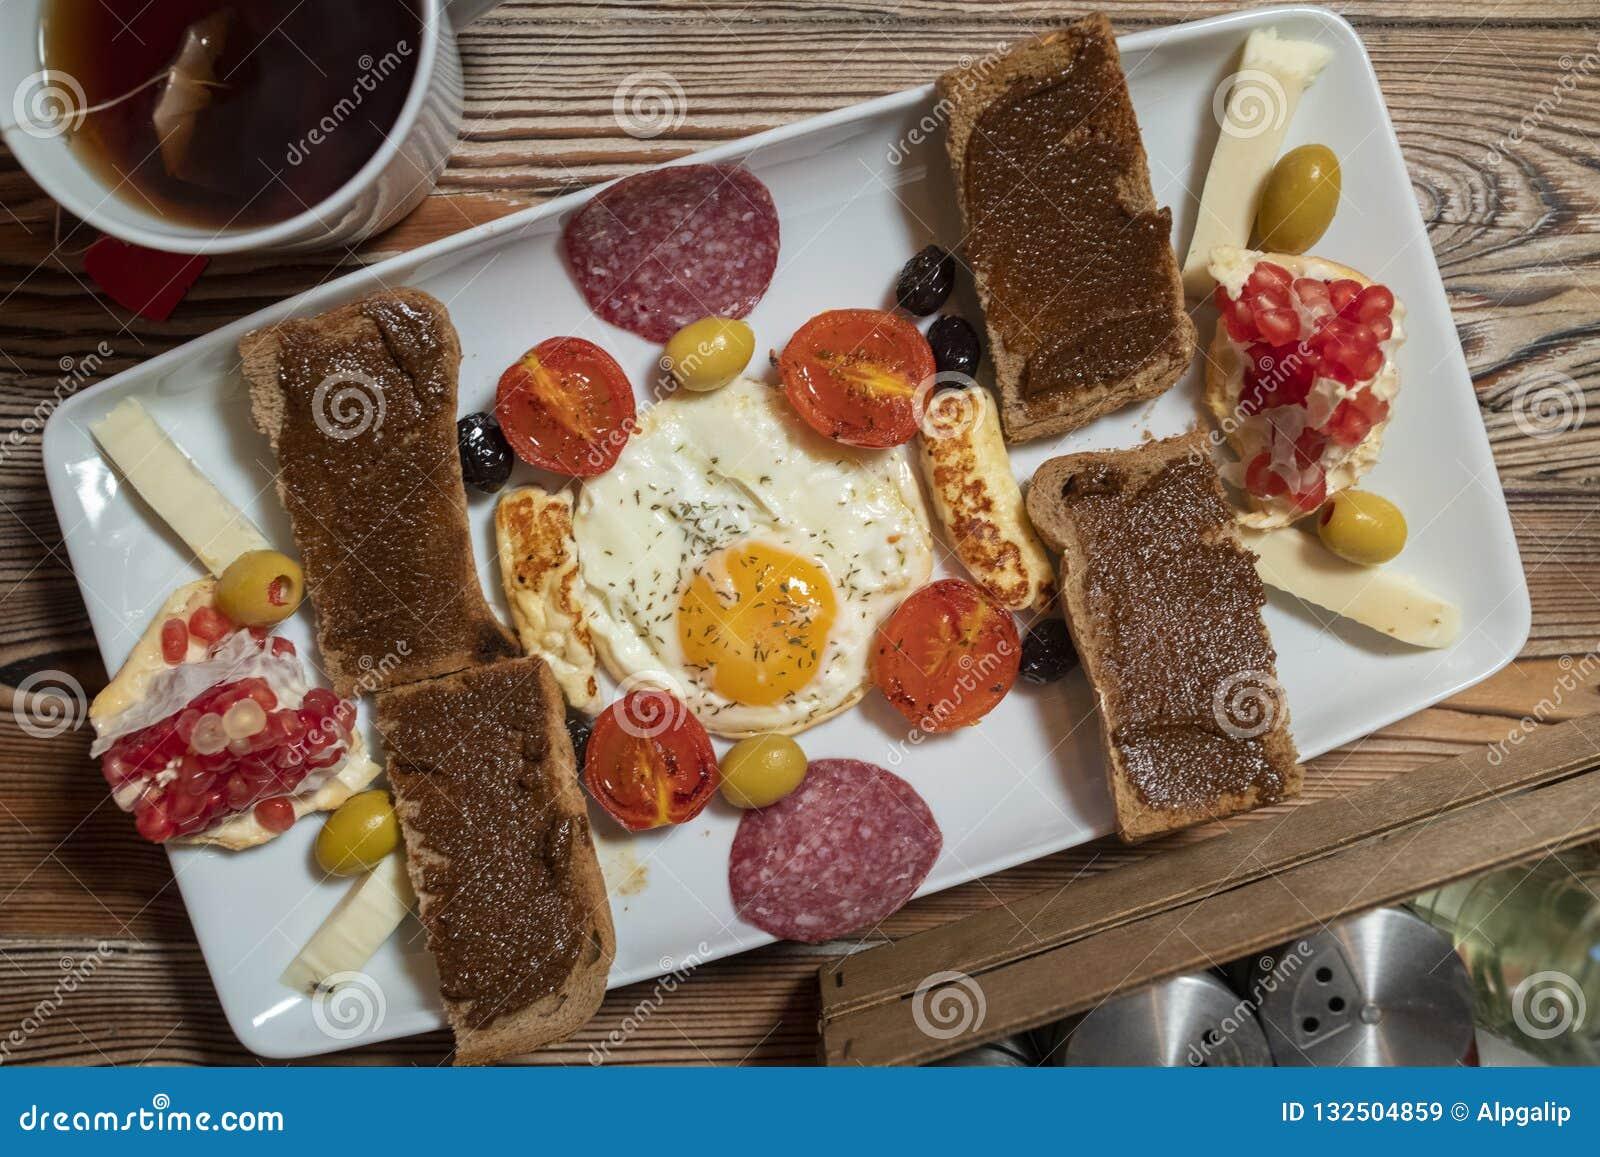 Frühstück mit Spiegelei, Roggenbrot, Granatapfel, Johannisbrotbaumpaste, Käsen, Oliven, trockener Salami, Tomaten und Tee